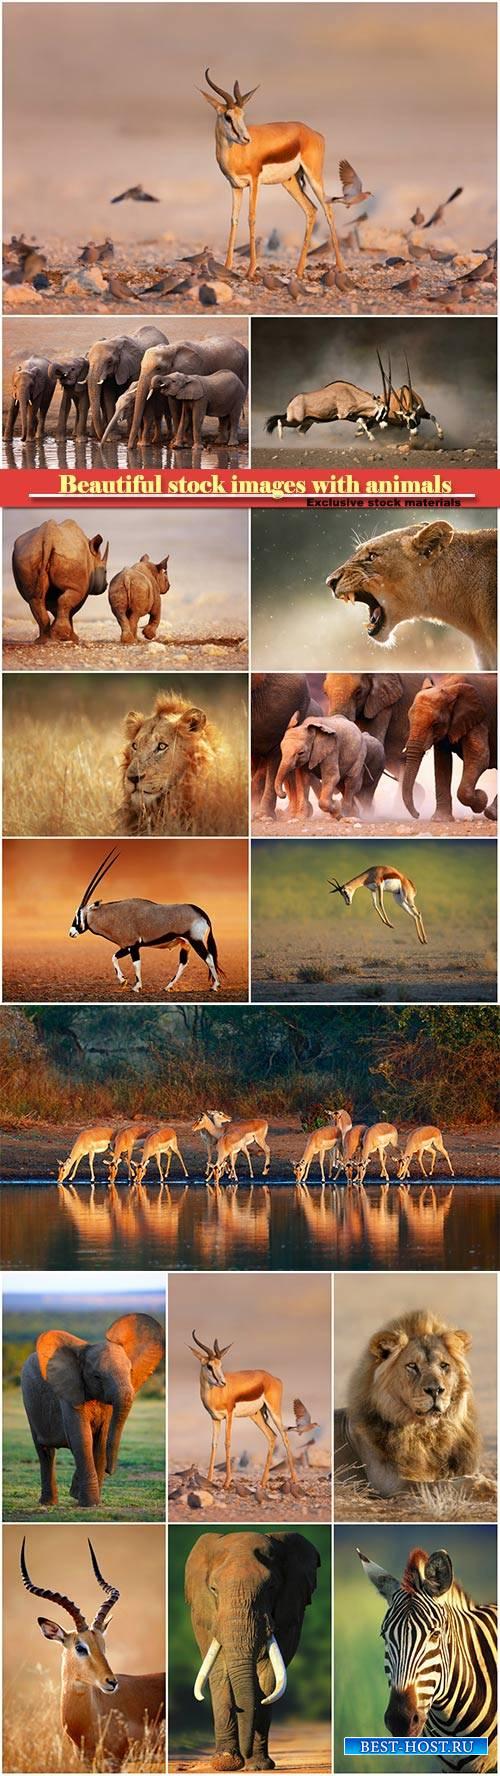 Beautiful stock images with animals, elephants, lion, zebra